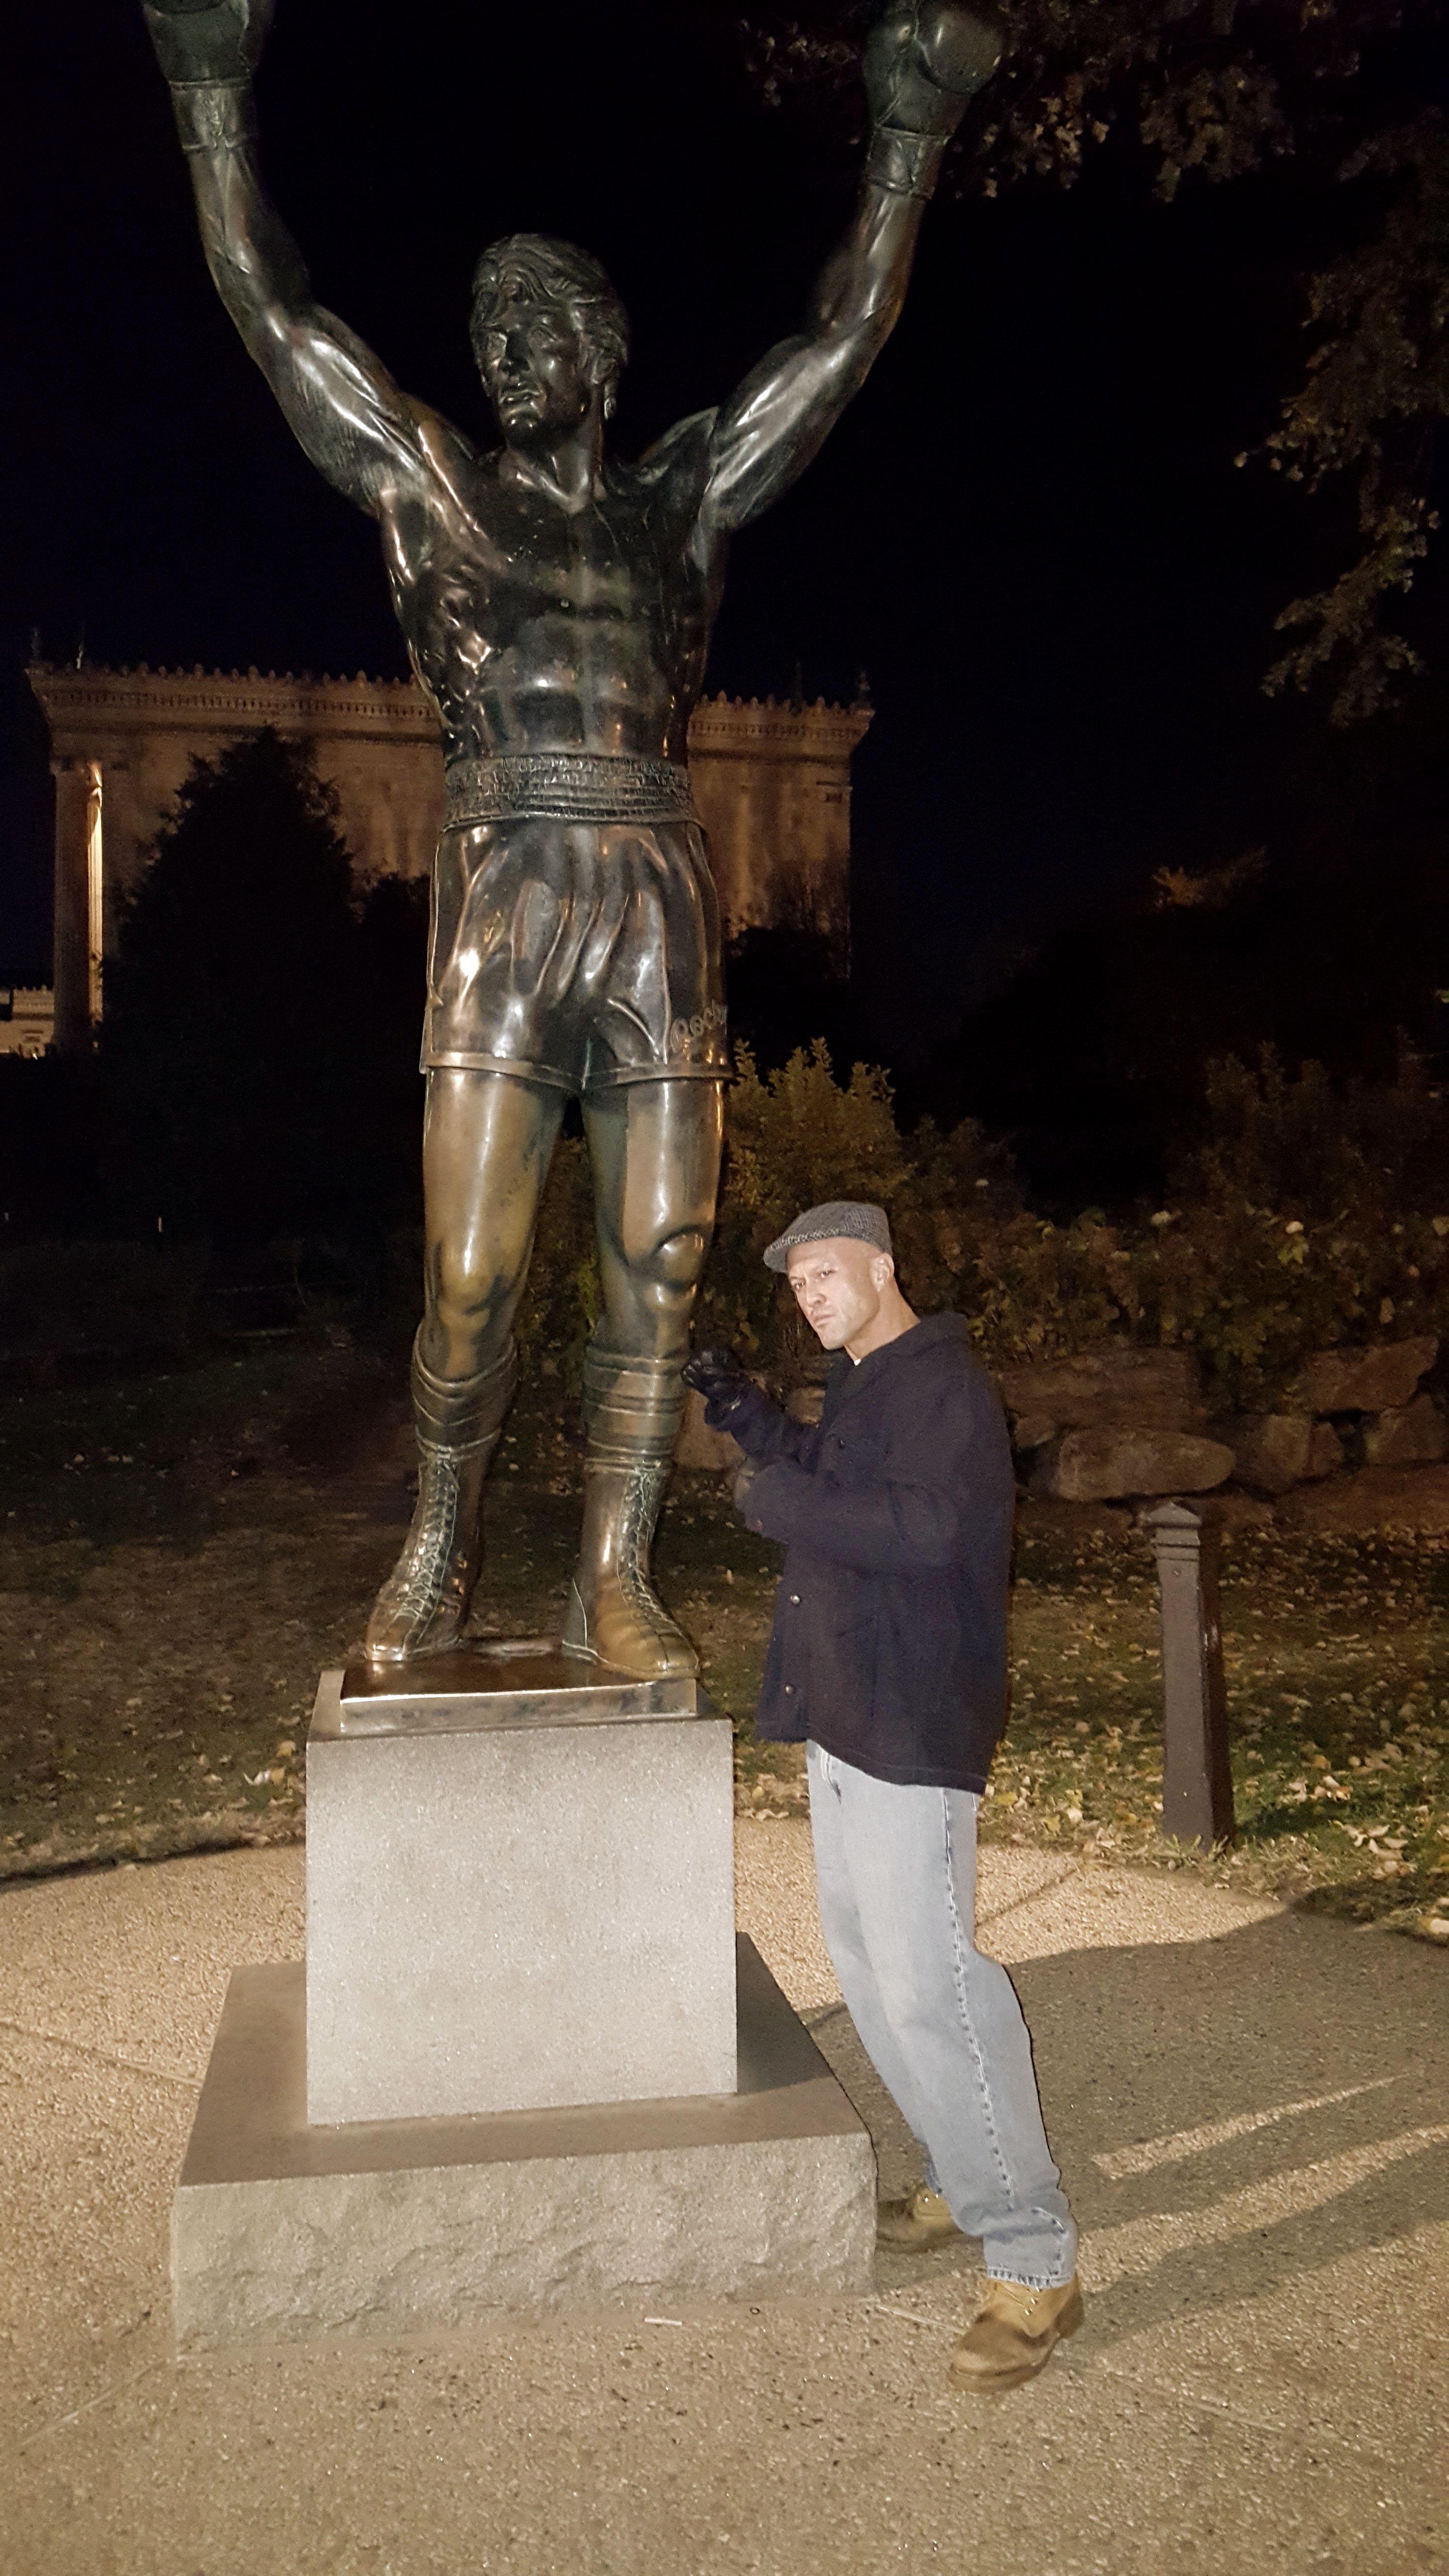 Model & Actor John Joseph Quinlan @ Sylvester Stallone Famous Rocky Balboa Statue #JohnQuinlan